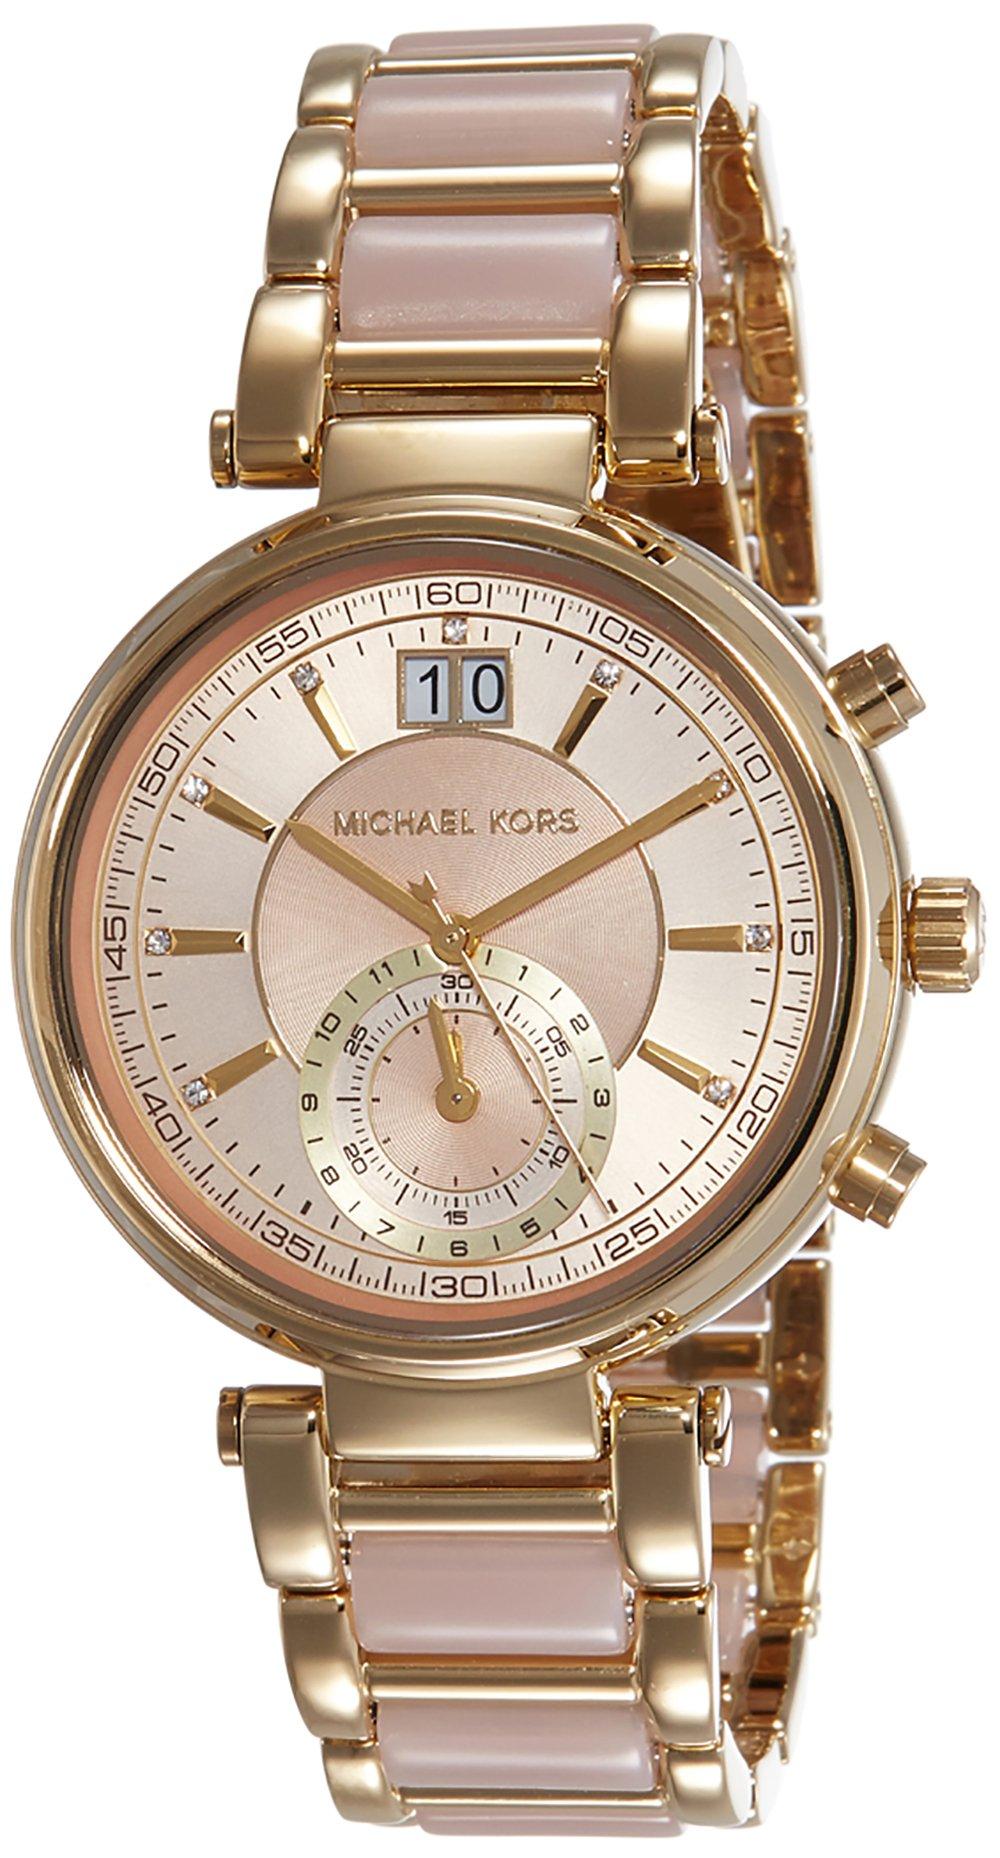 Michael Kors Women's Sawyer Two-Tone Watch MK6360